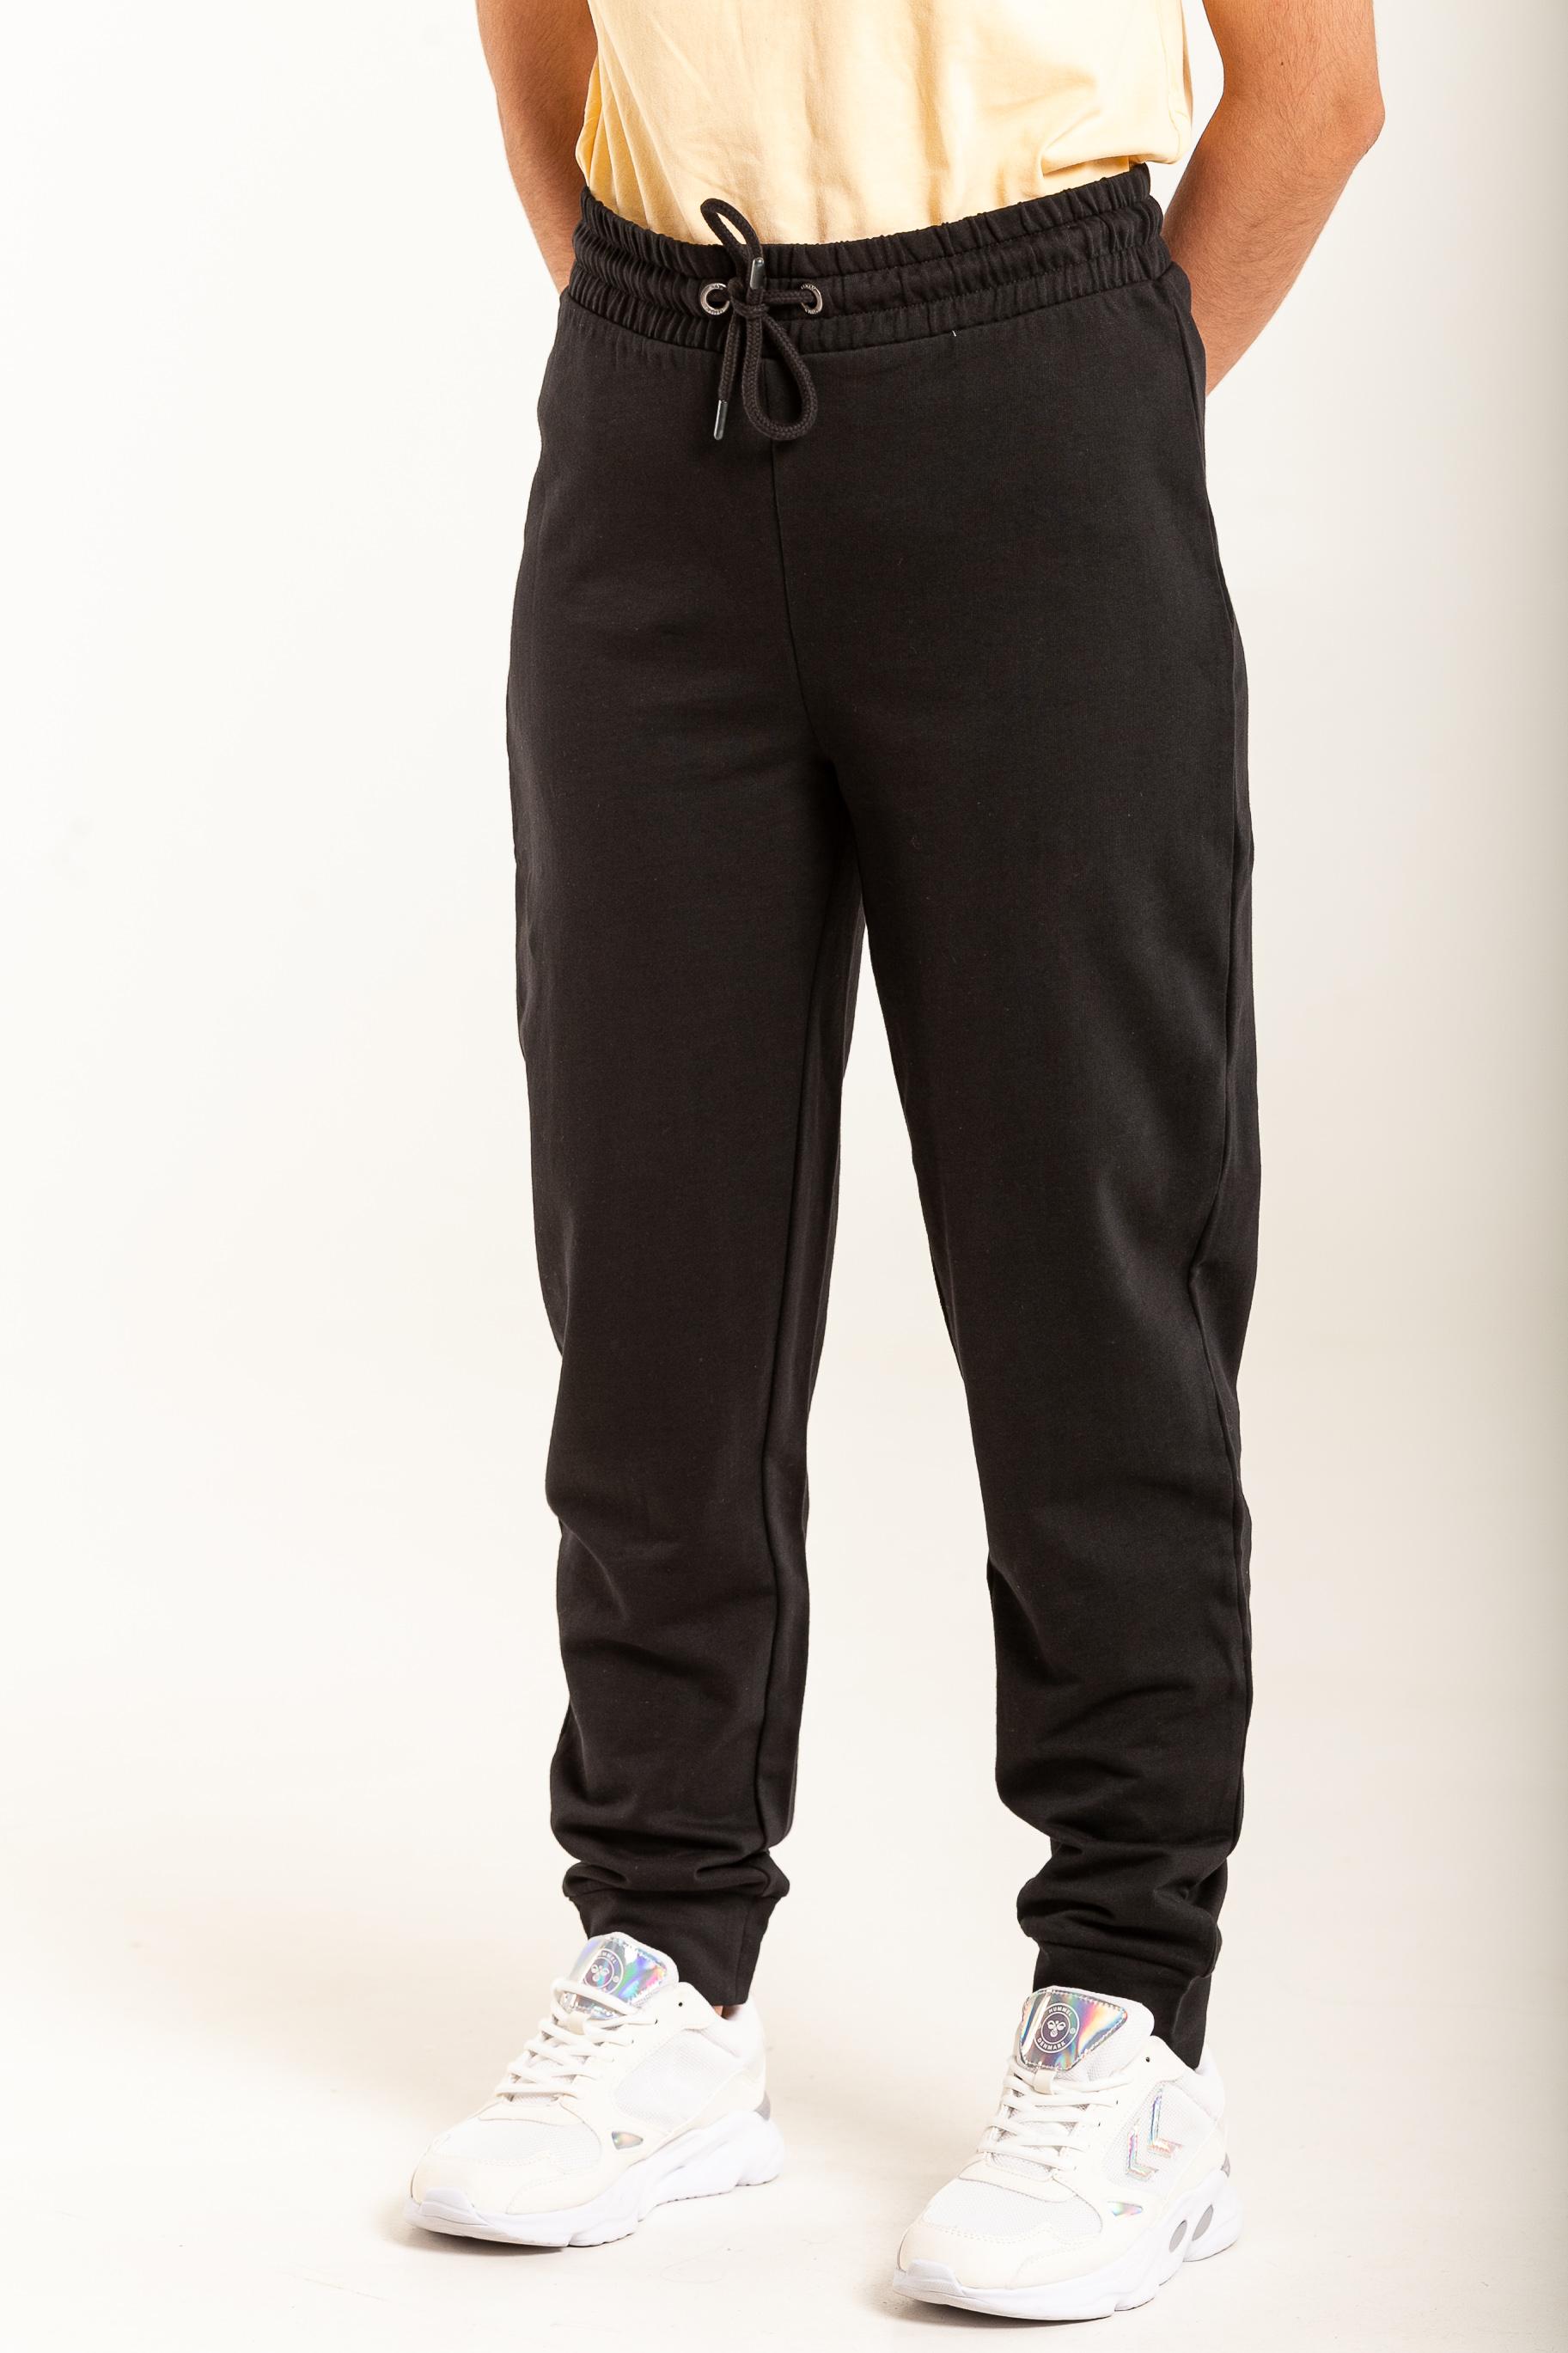 Pantaloni ONLY Casual (3307) photo